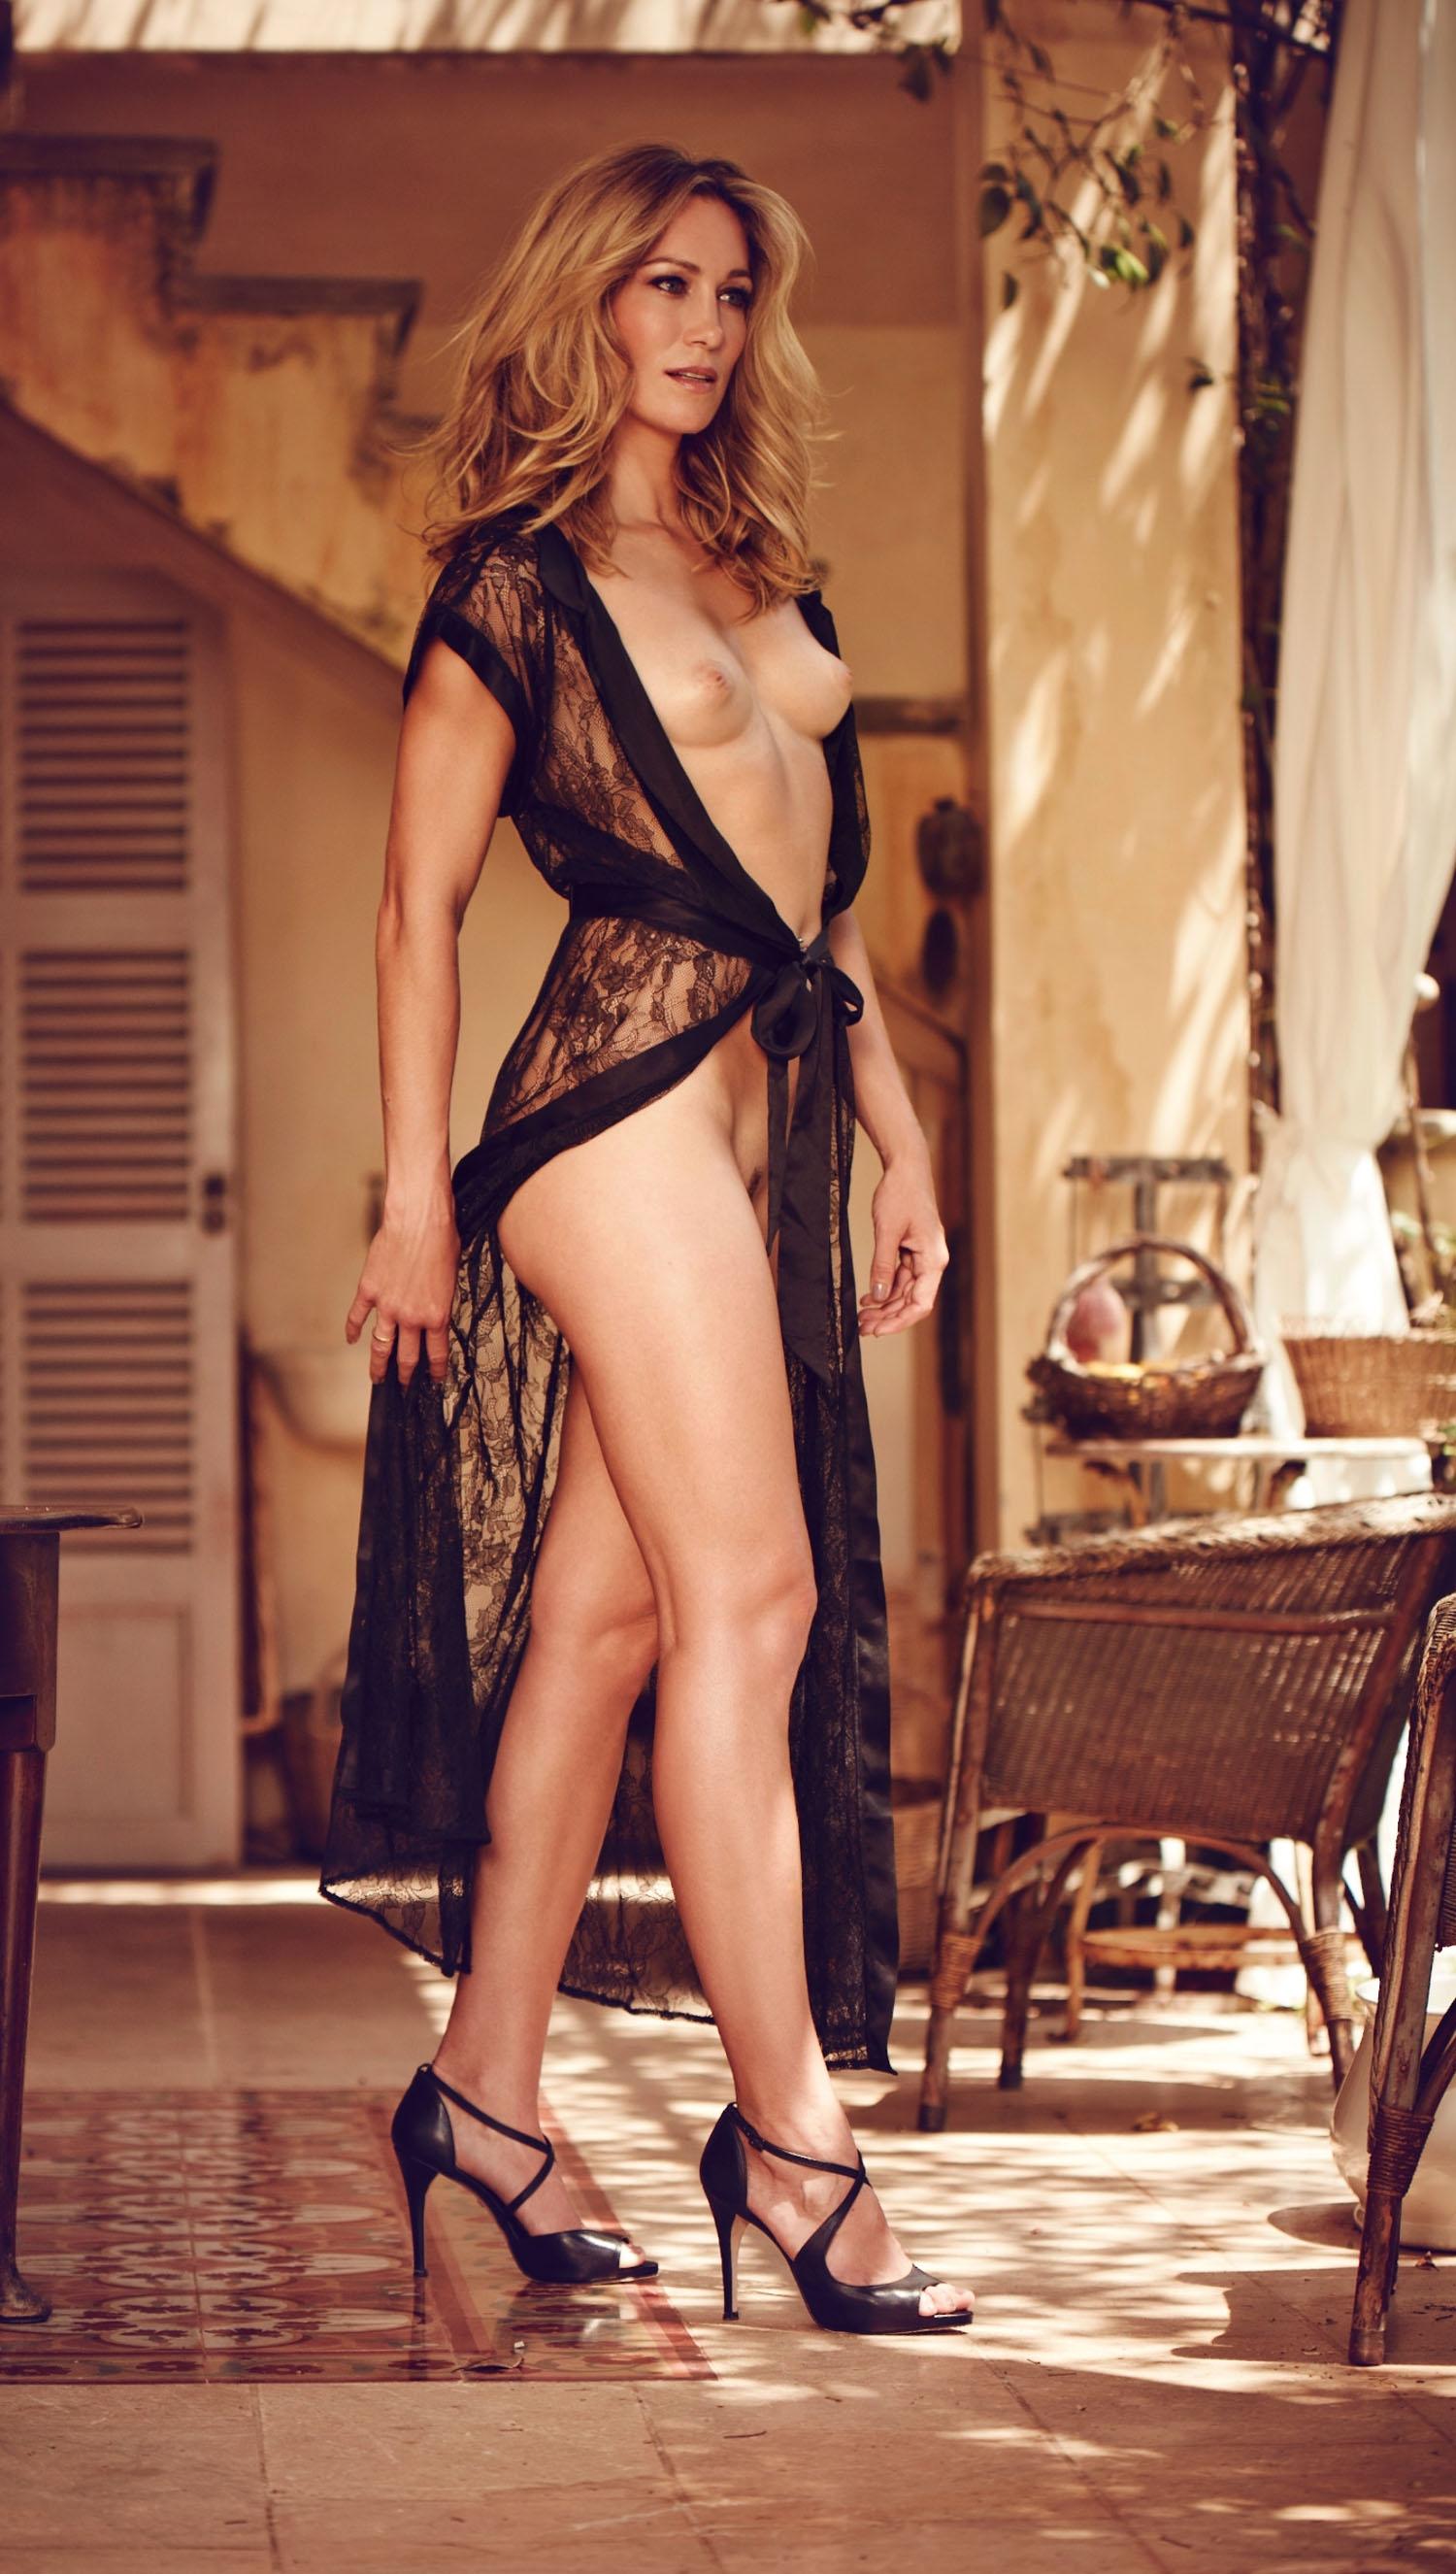 Кристин Тэйсс голая. Фото - 69